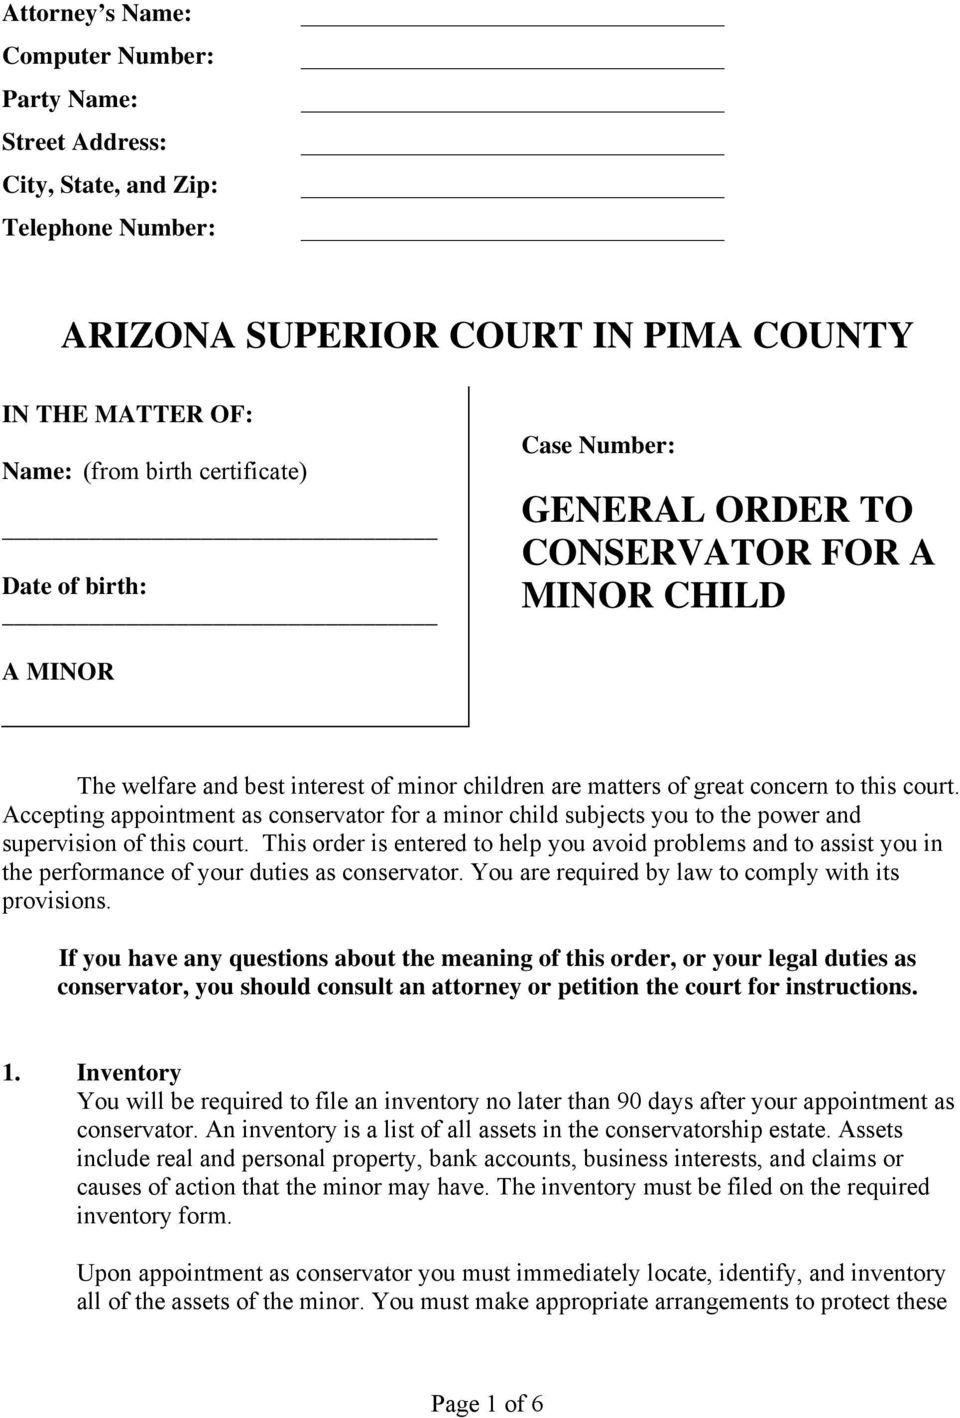 Probate Inventory Form Arizona